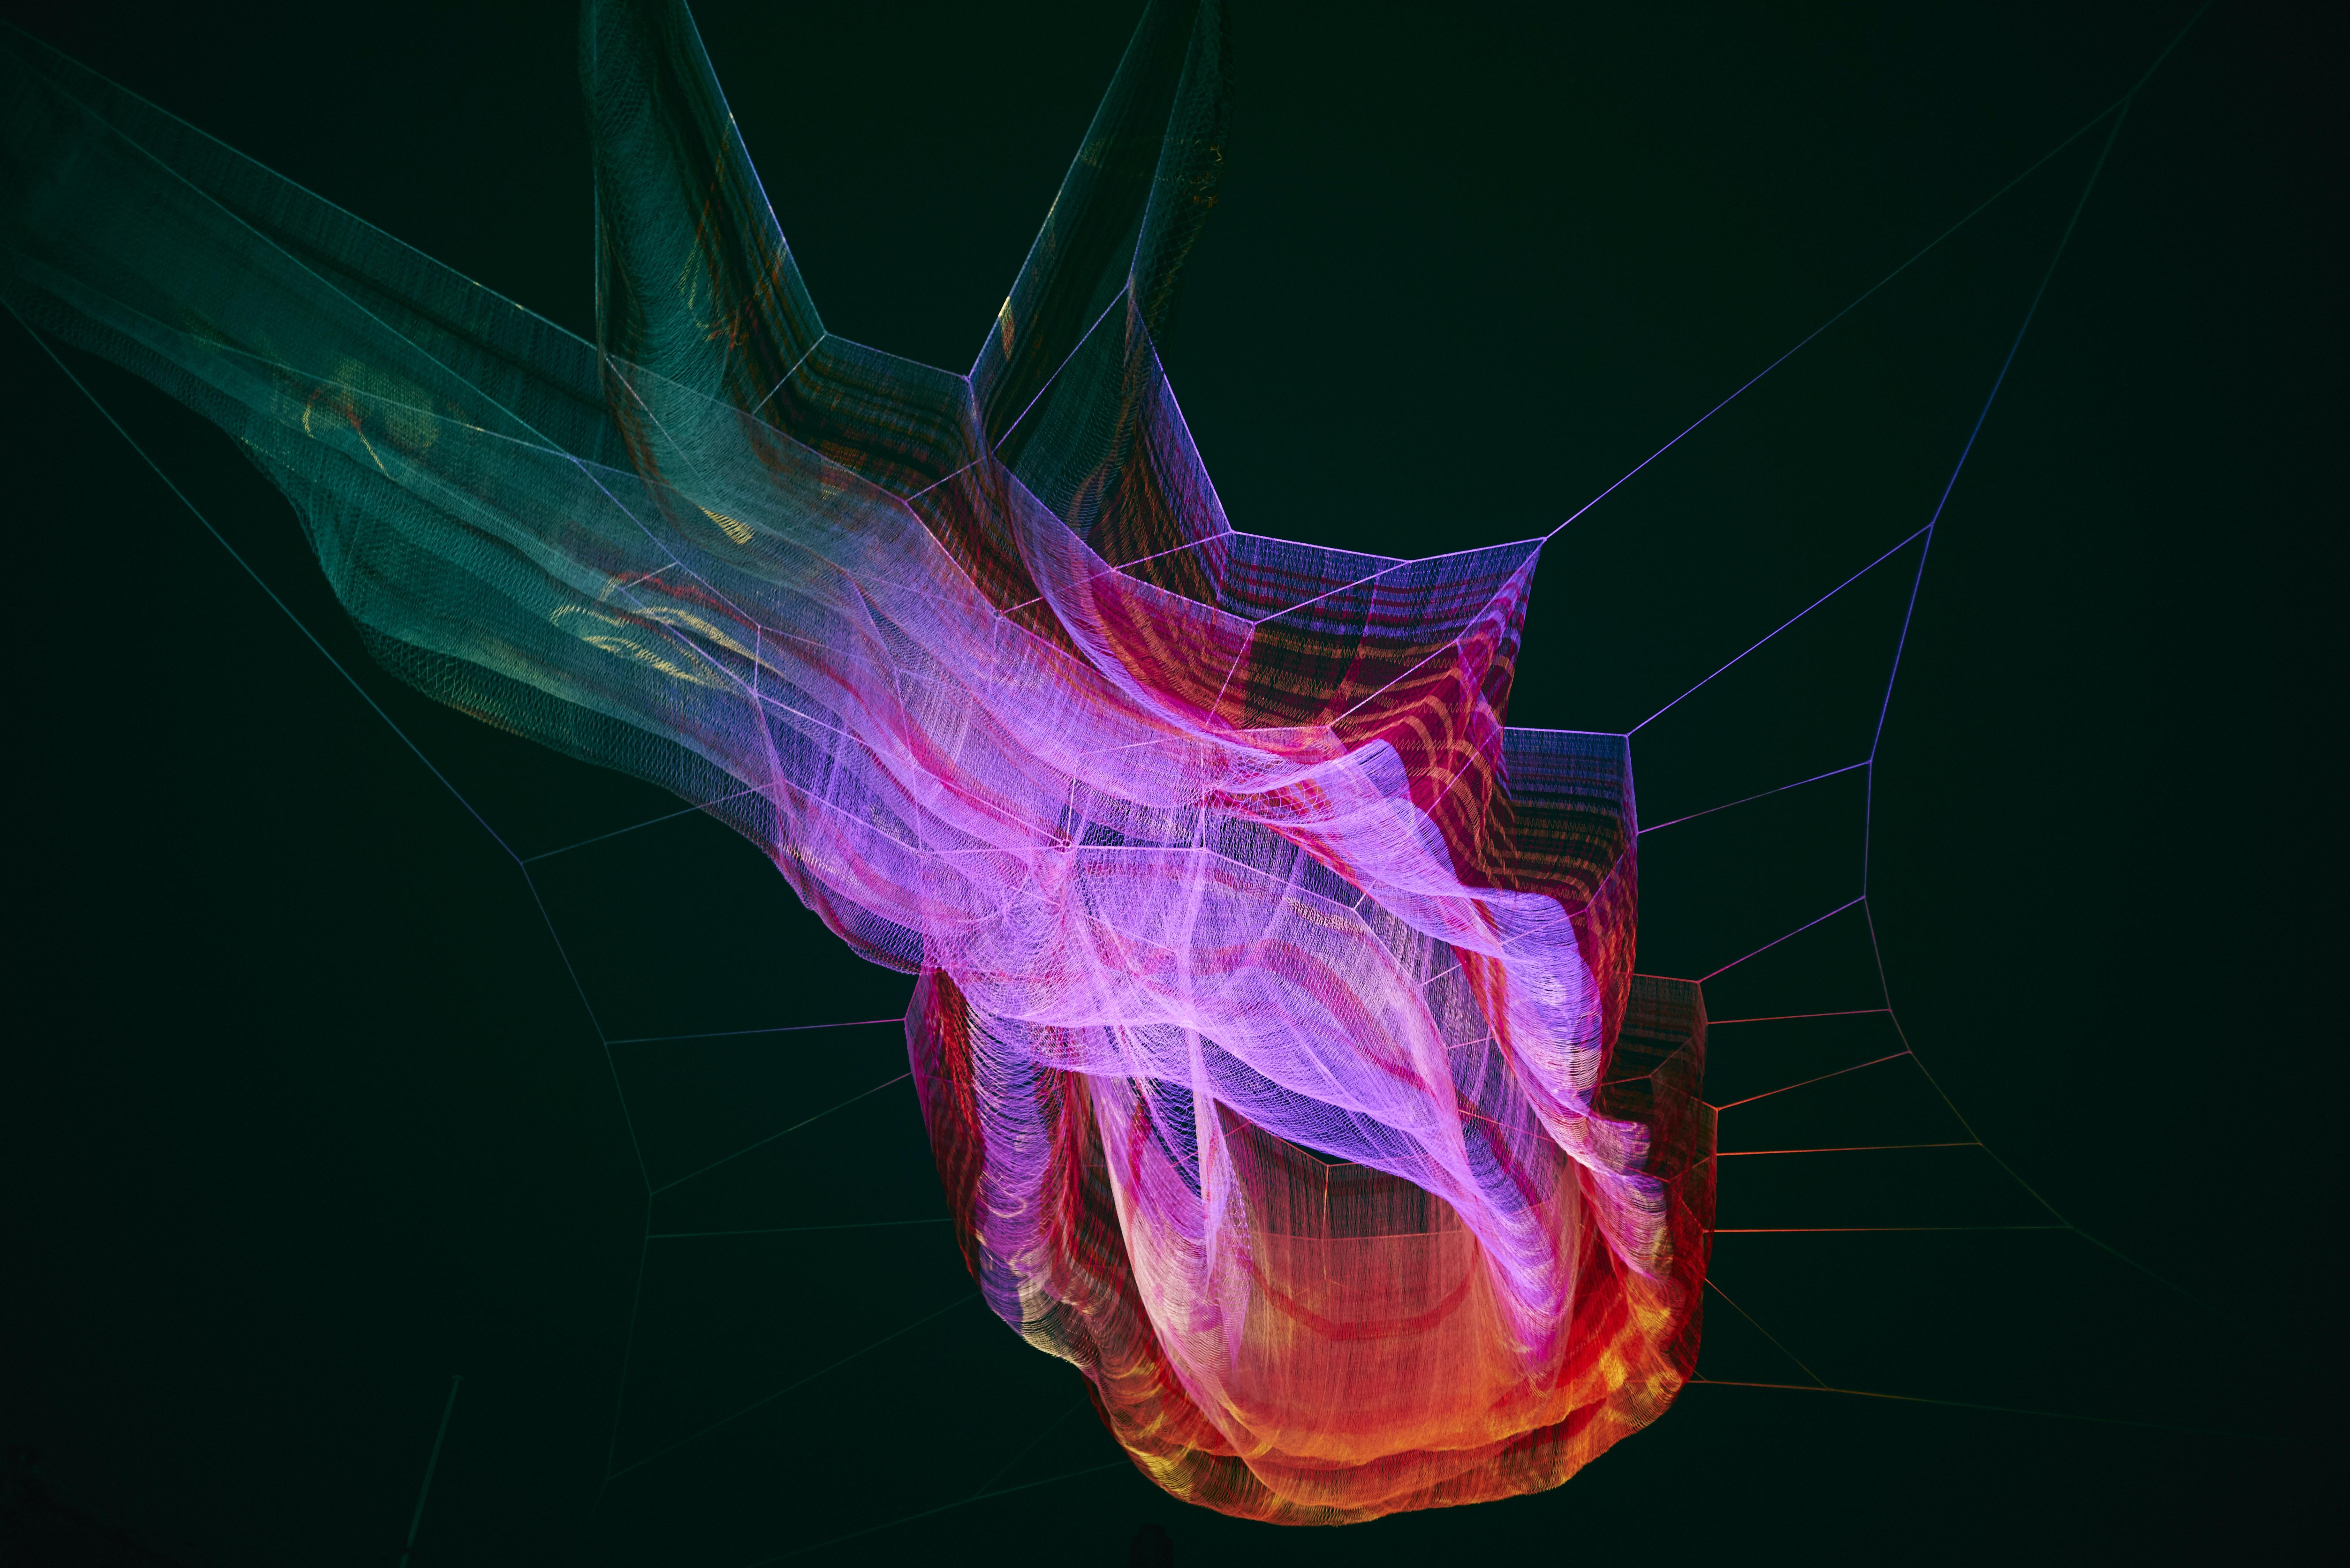 closeup photo of abstract illustration